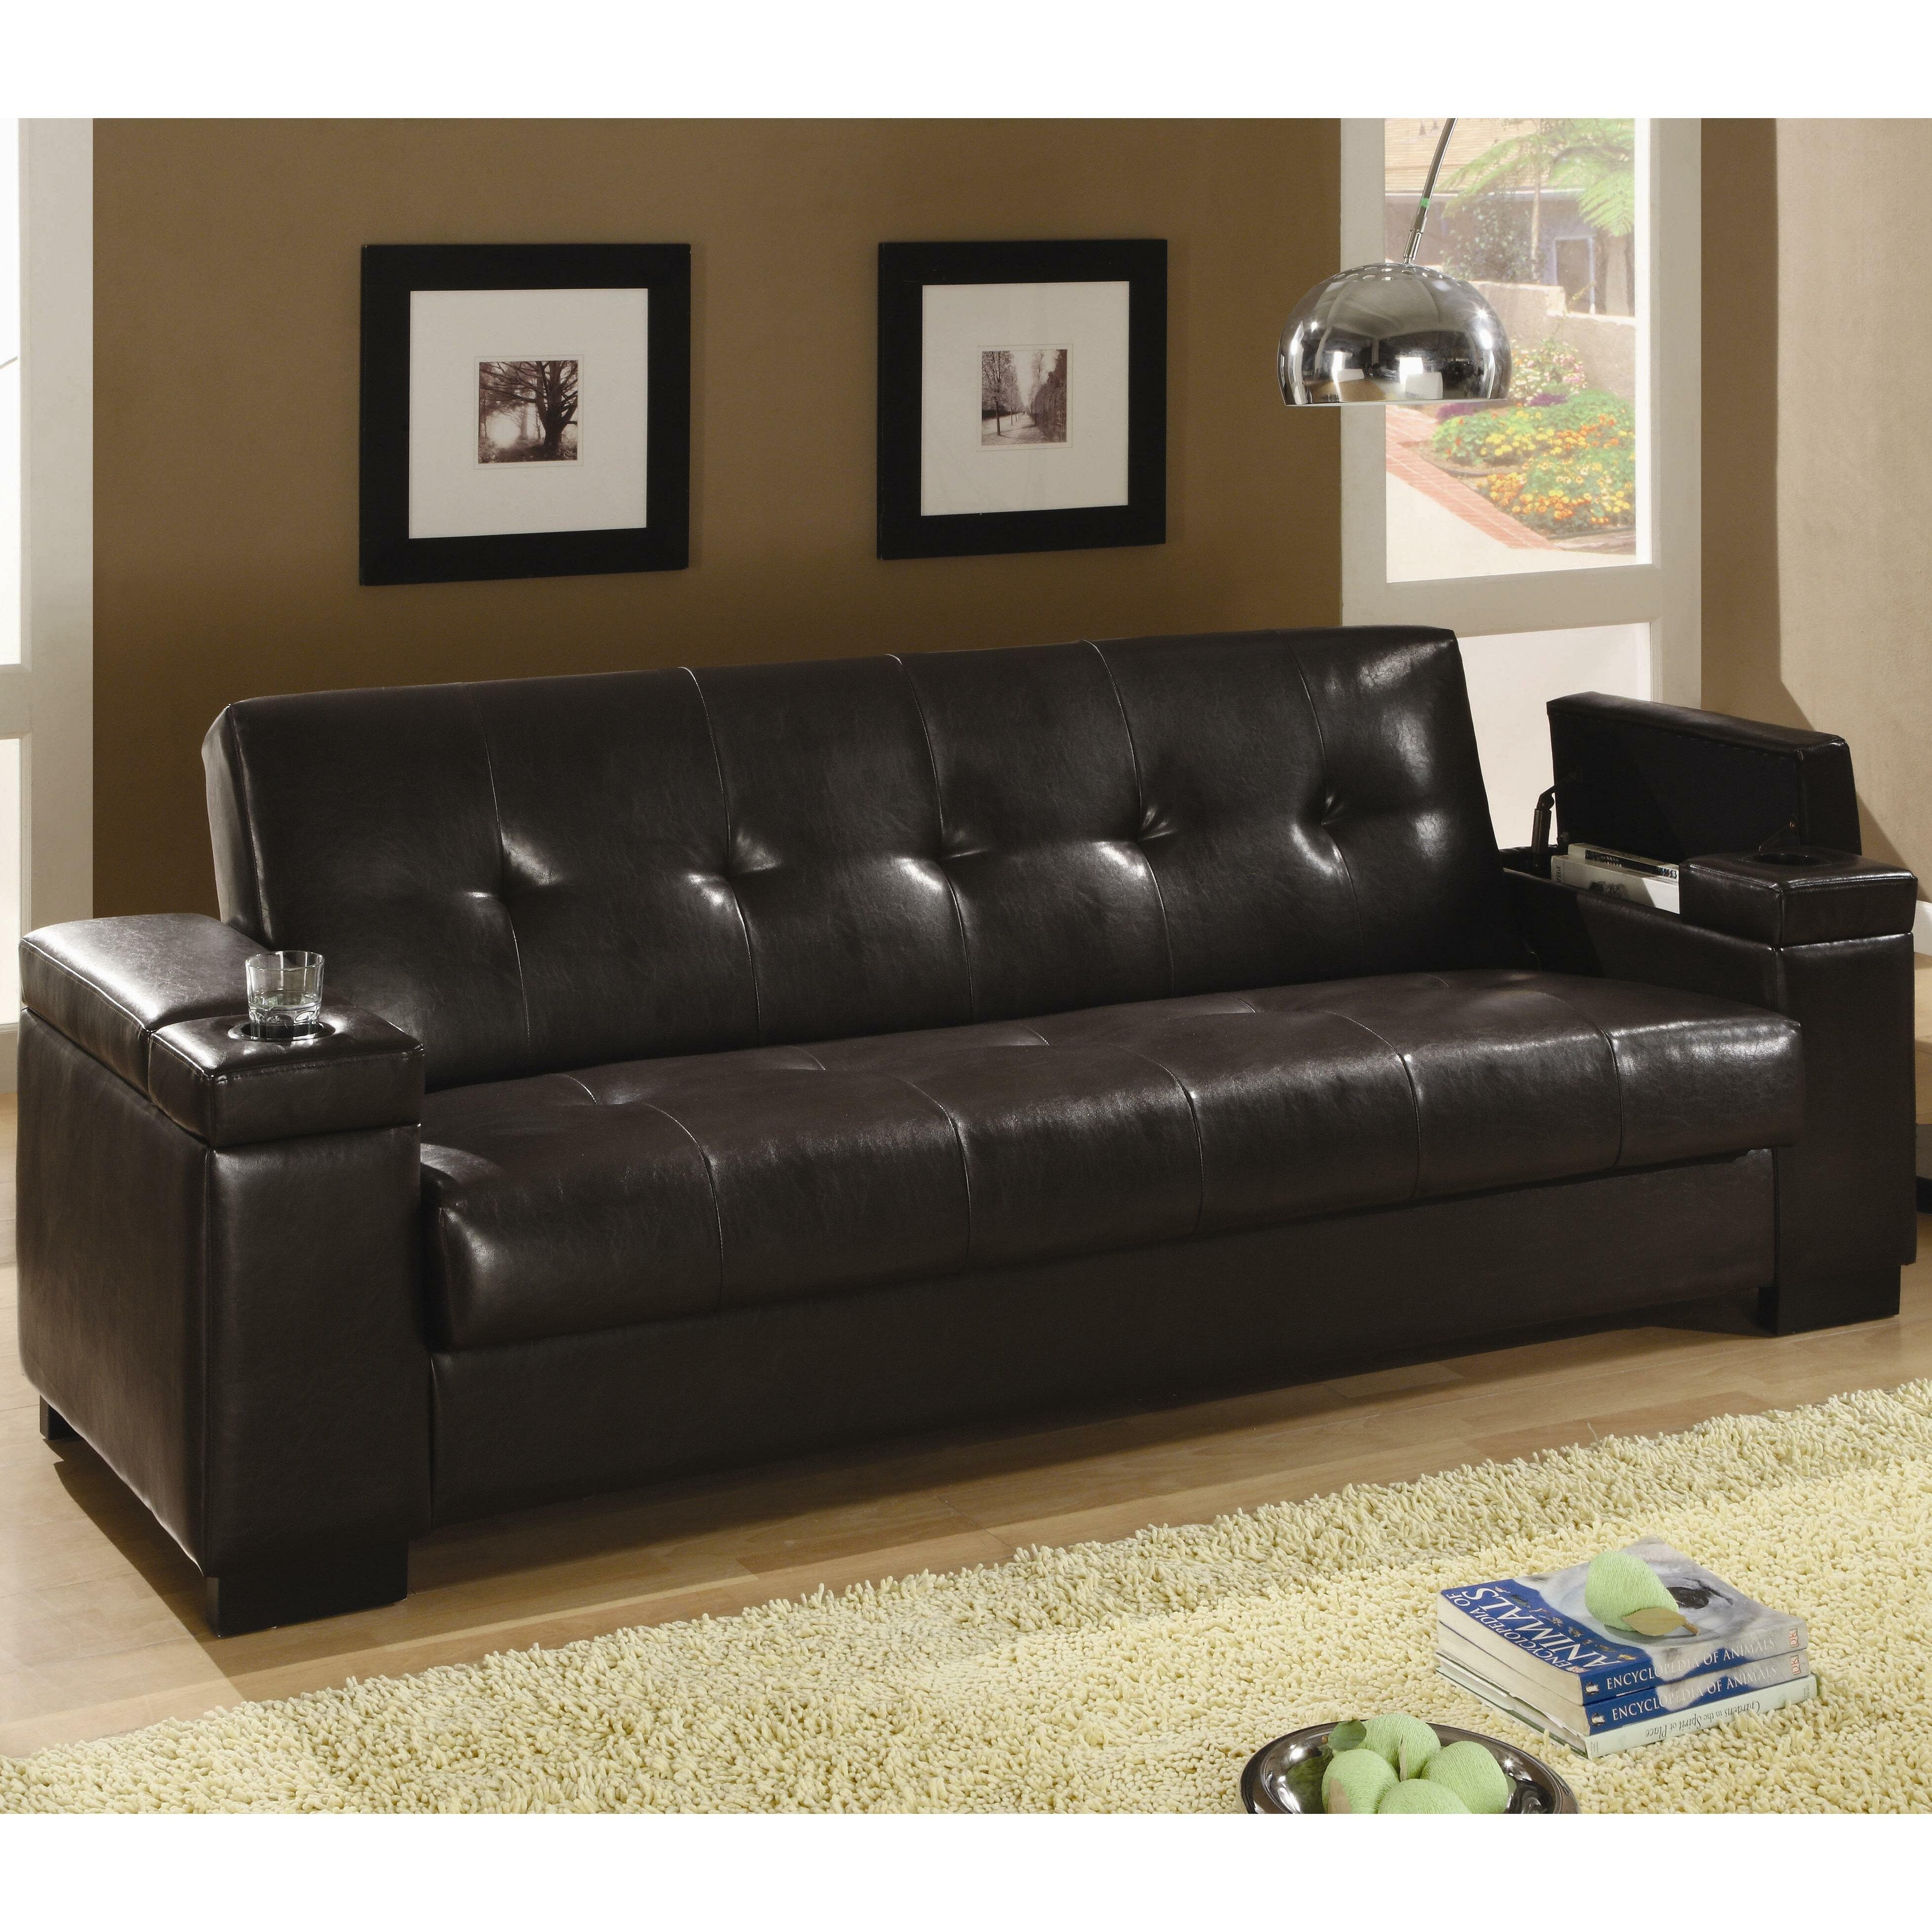 Wildon Home ® San Diego Sleeper Sofa & Reviews  Wayfair